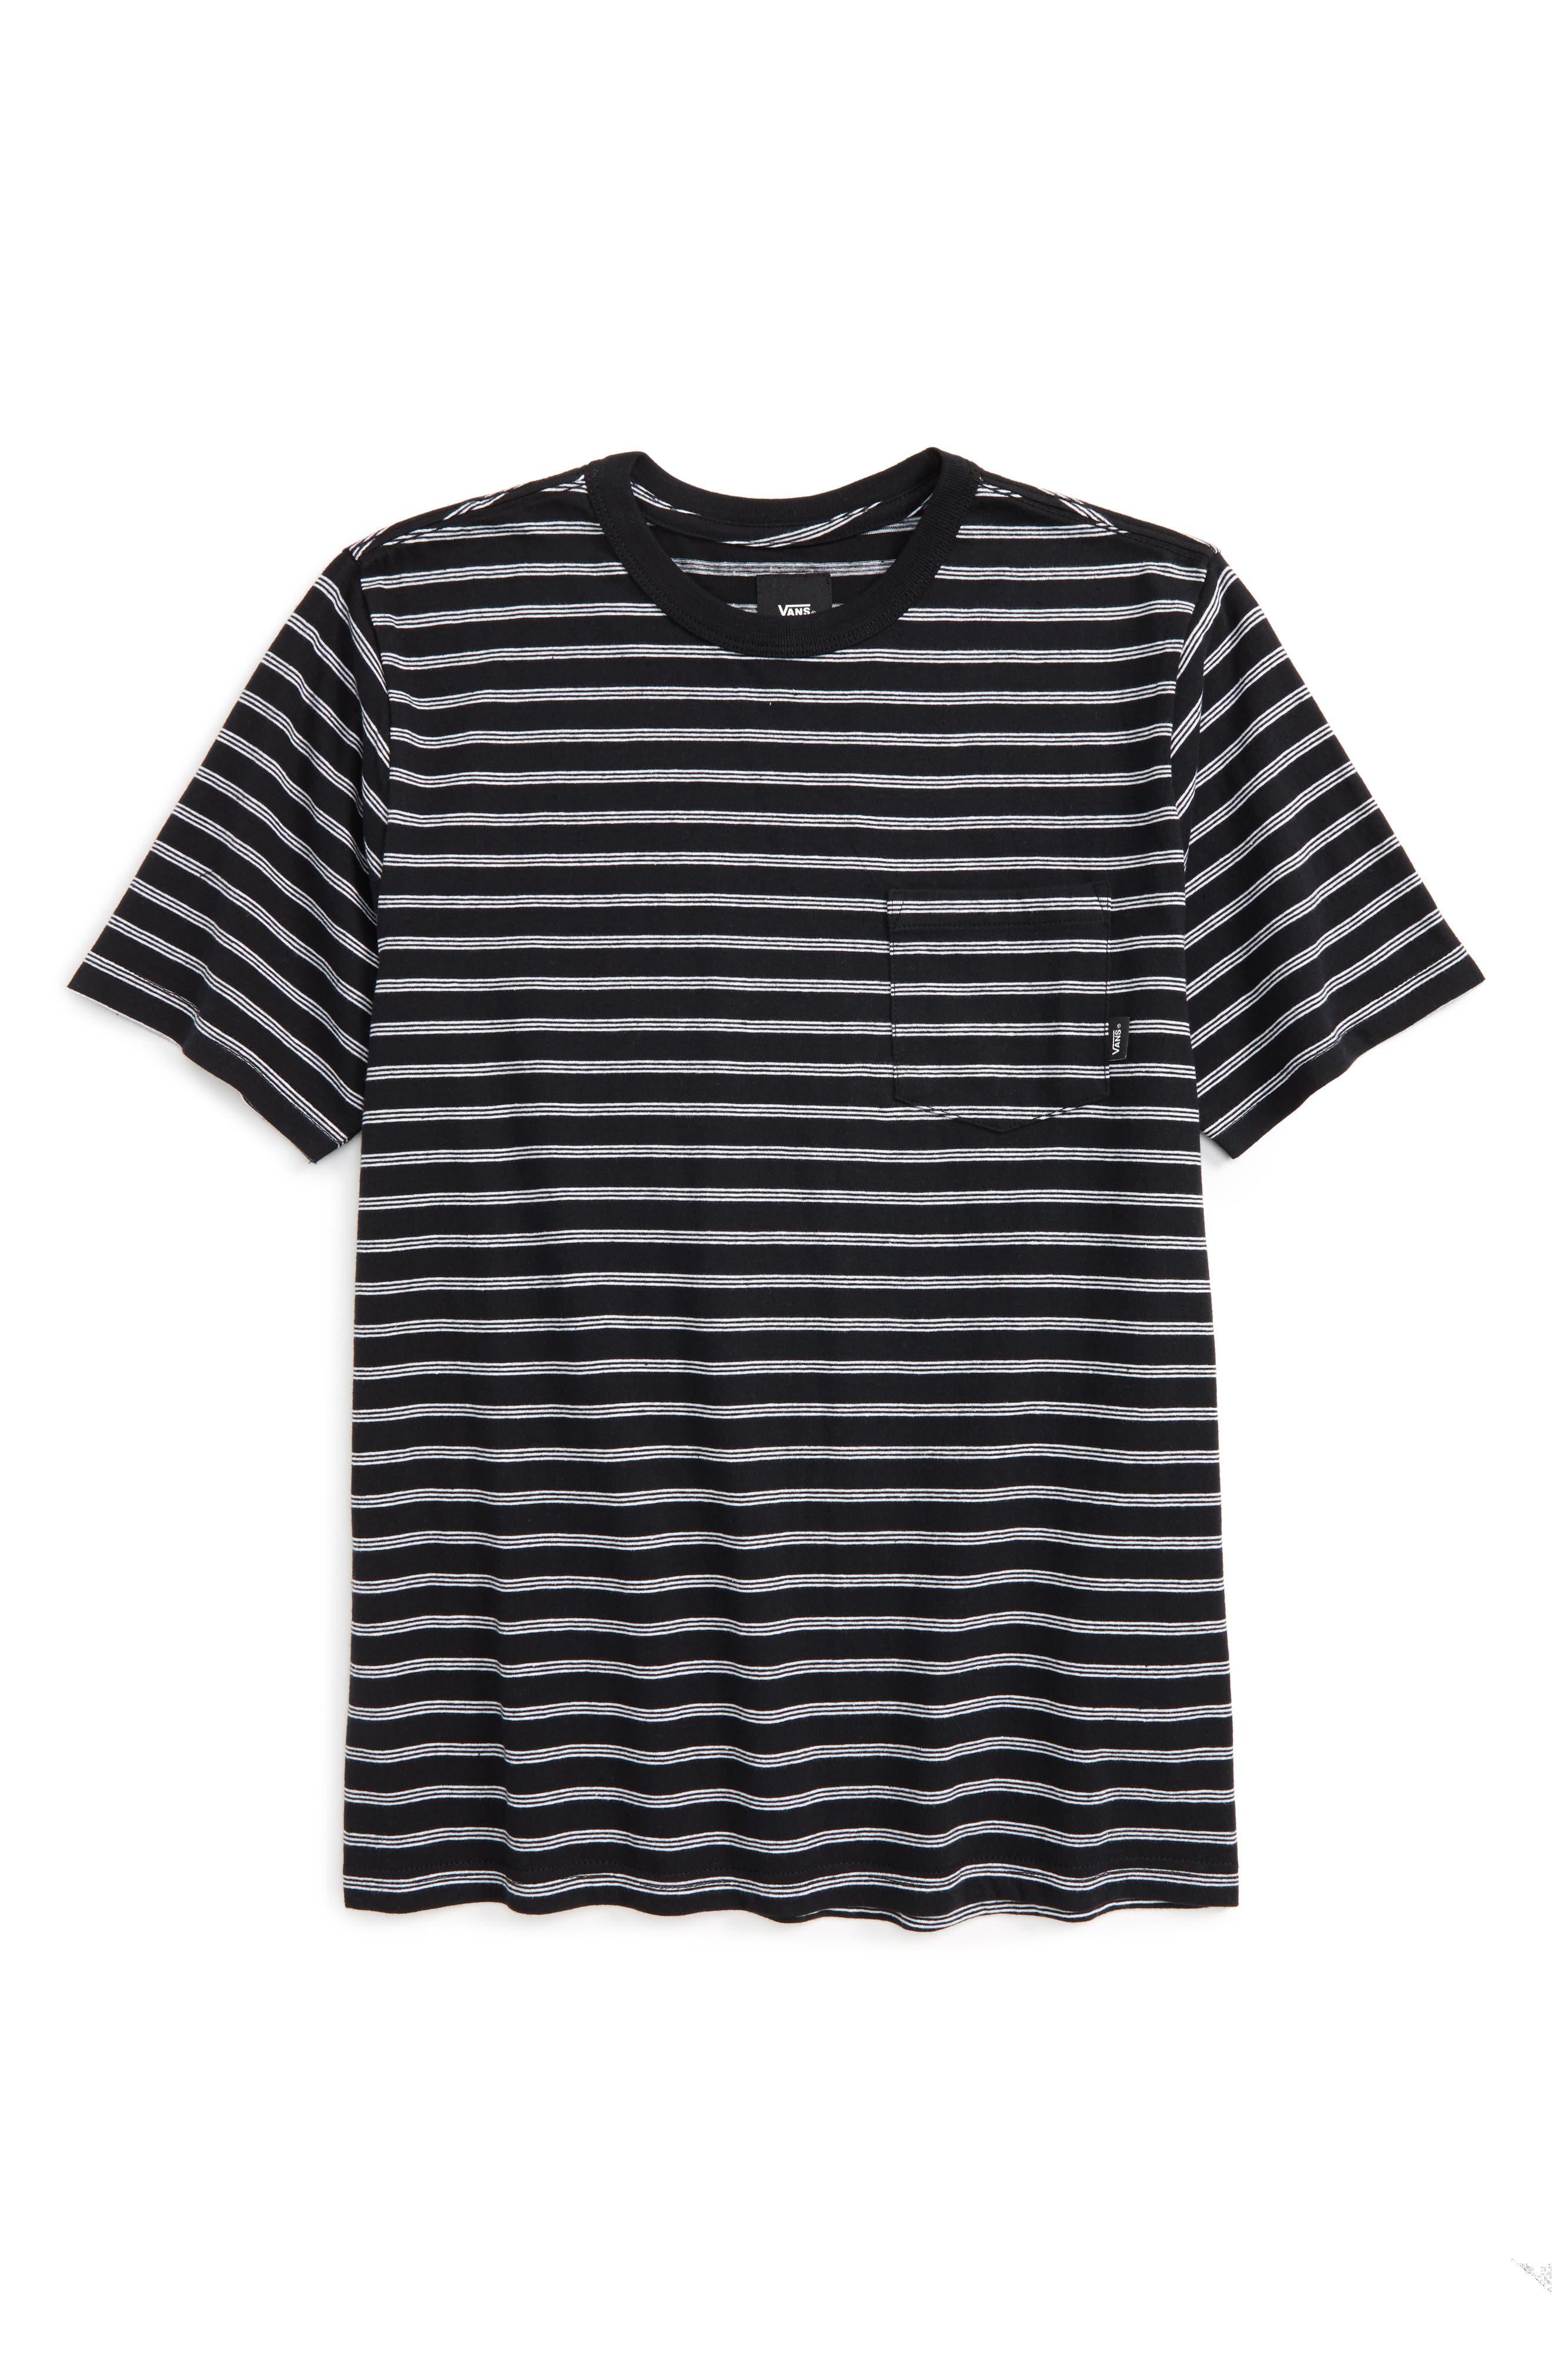 Vans Lined Up Knit T-Shirt (Big Boys)